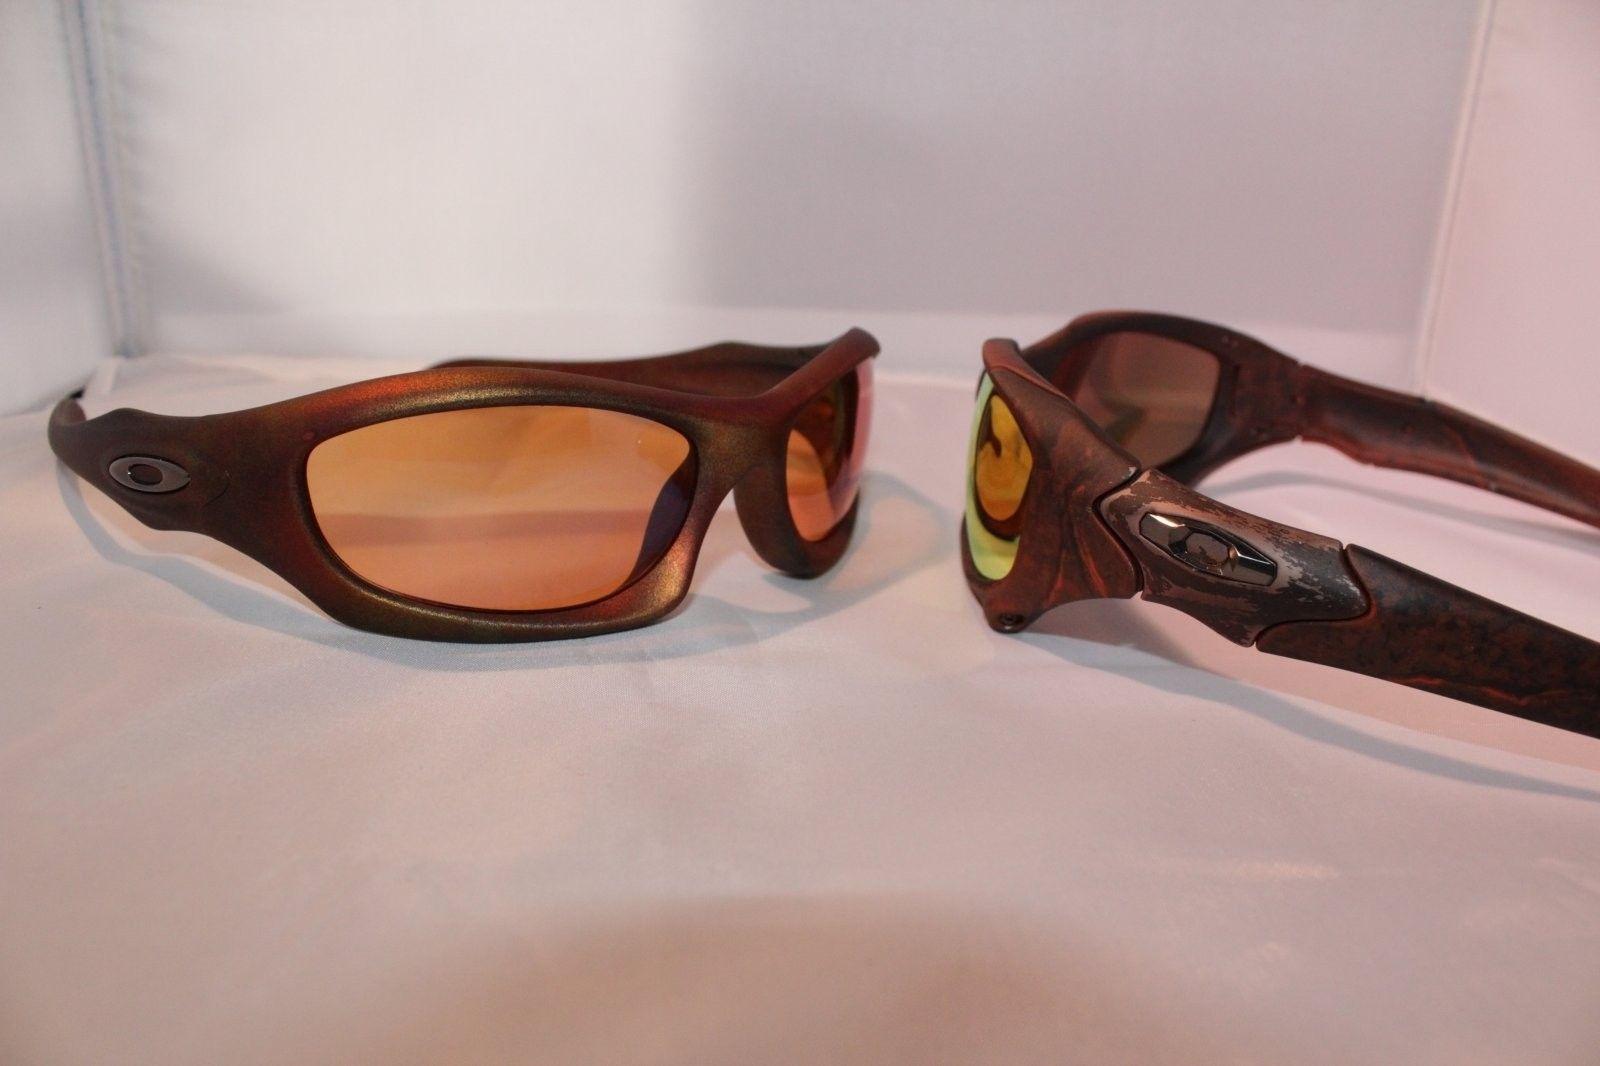 Custom Magma/Decay Pit Boss 1, Dr Chop Dirty Dog, Rust Face Off - oakley pics 10-24-14 (44).JPG